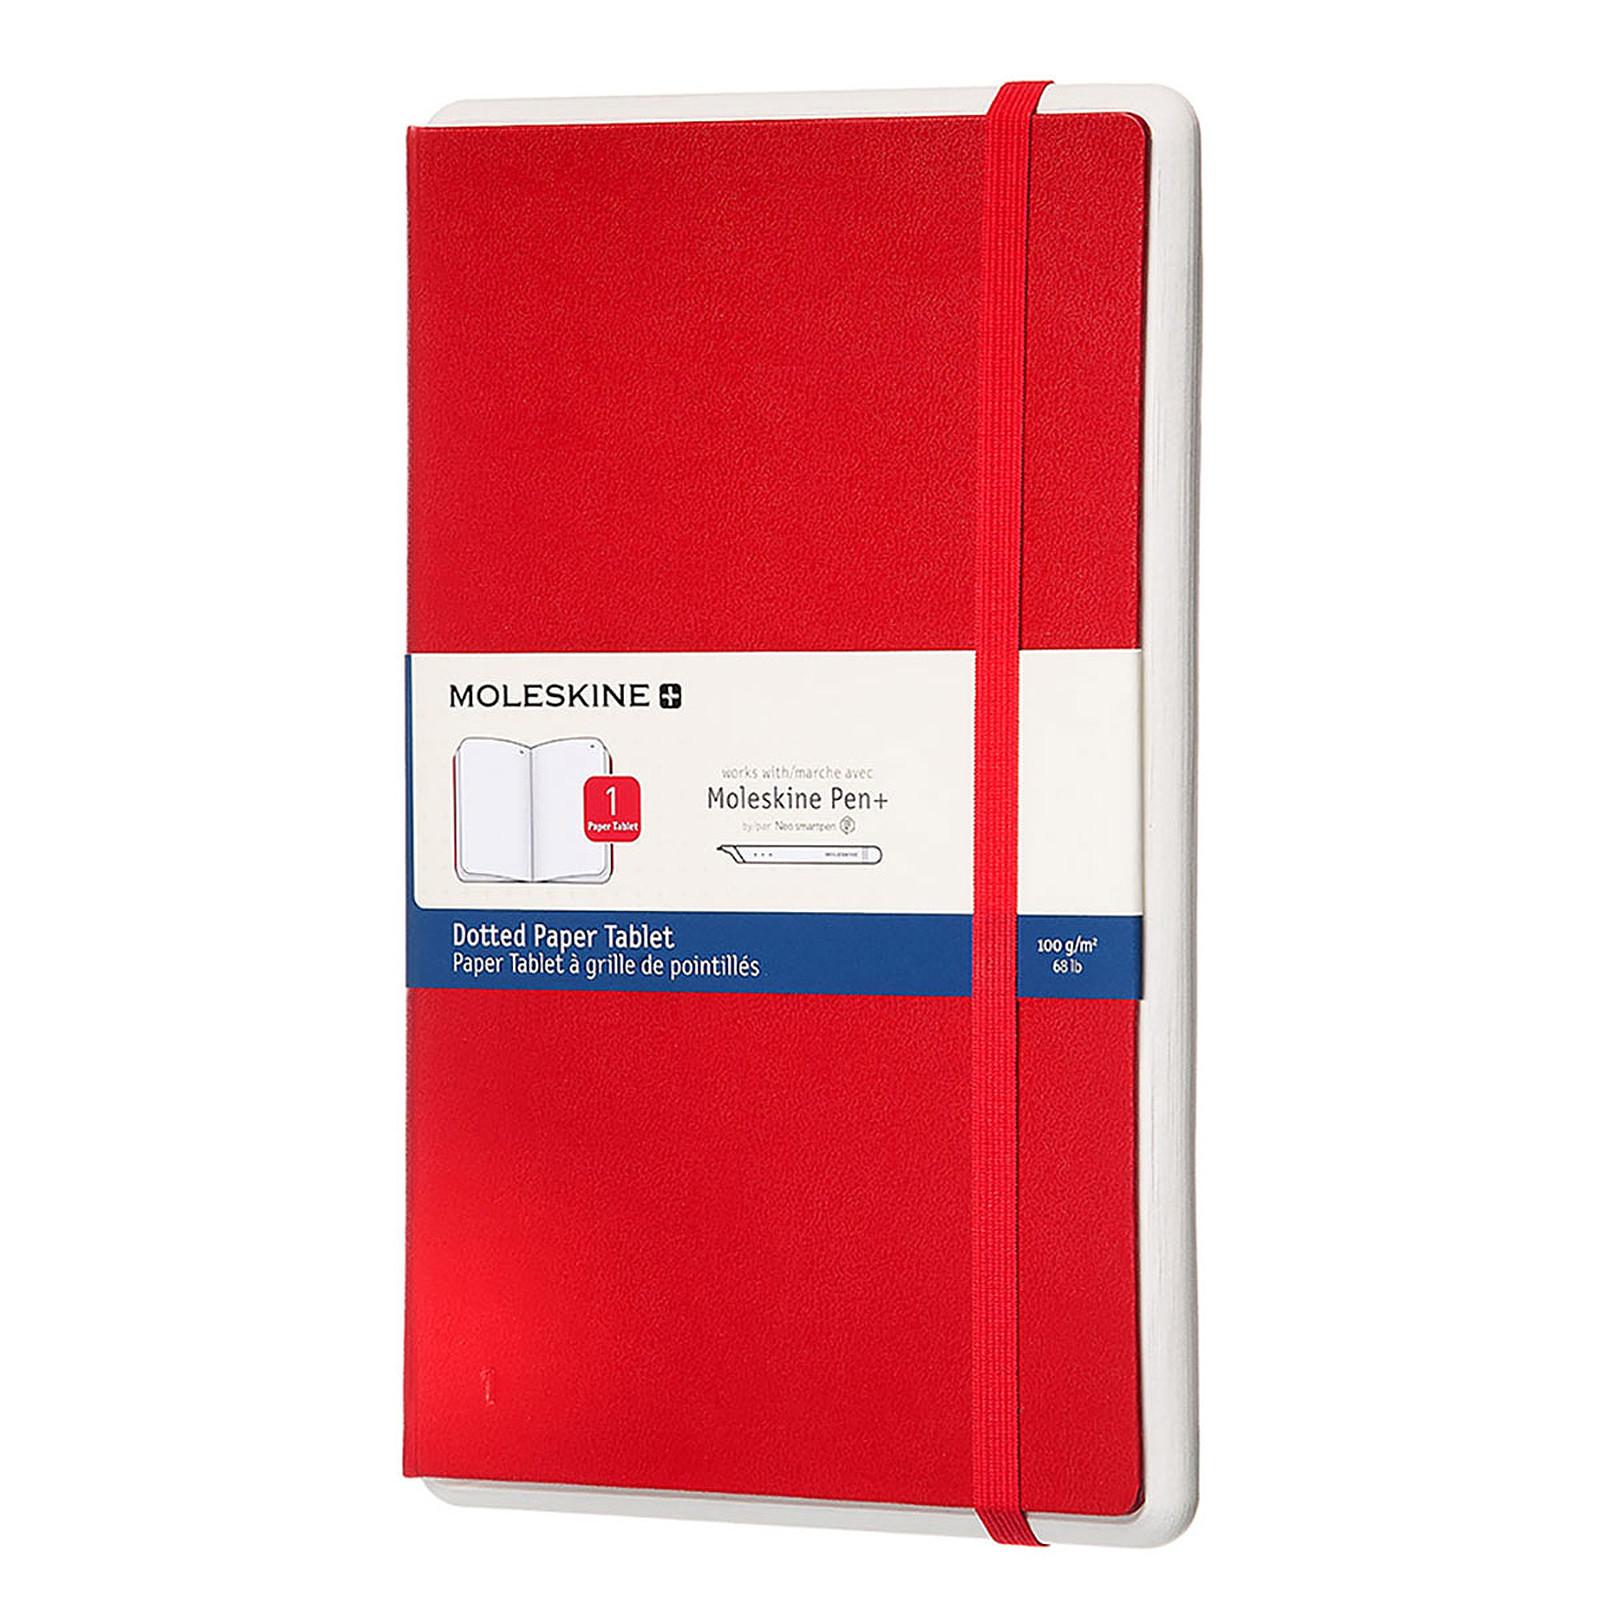 Moleskine Paper Tablet Hardcover Large Dotted Rouge